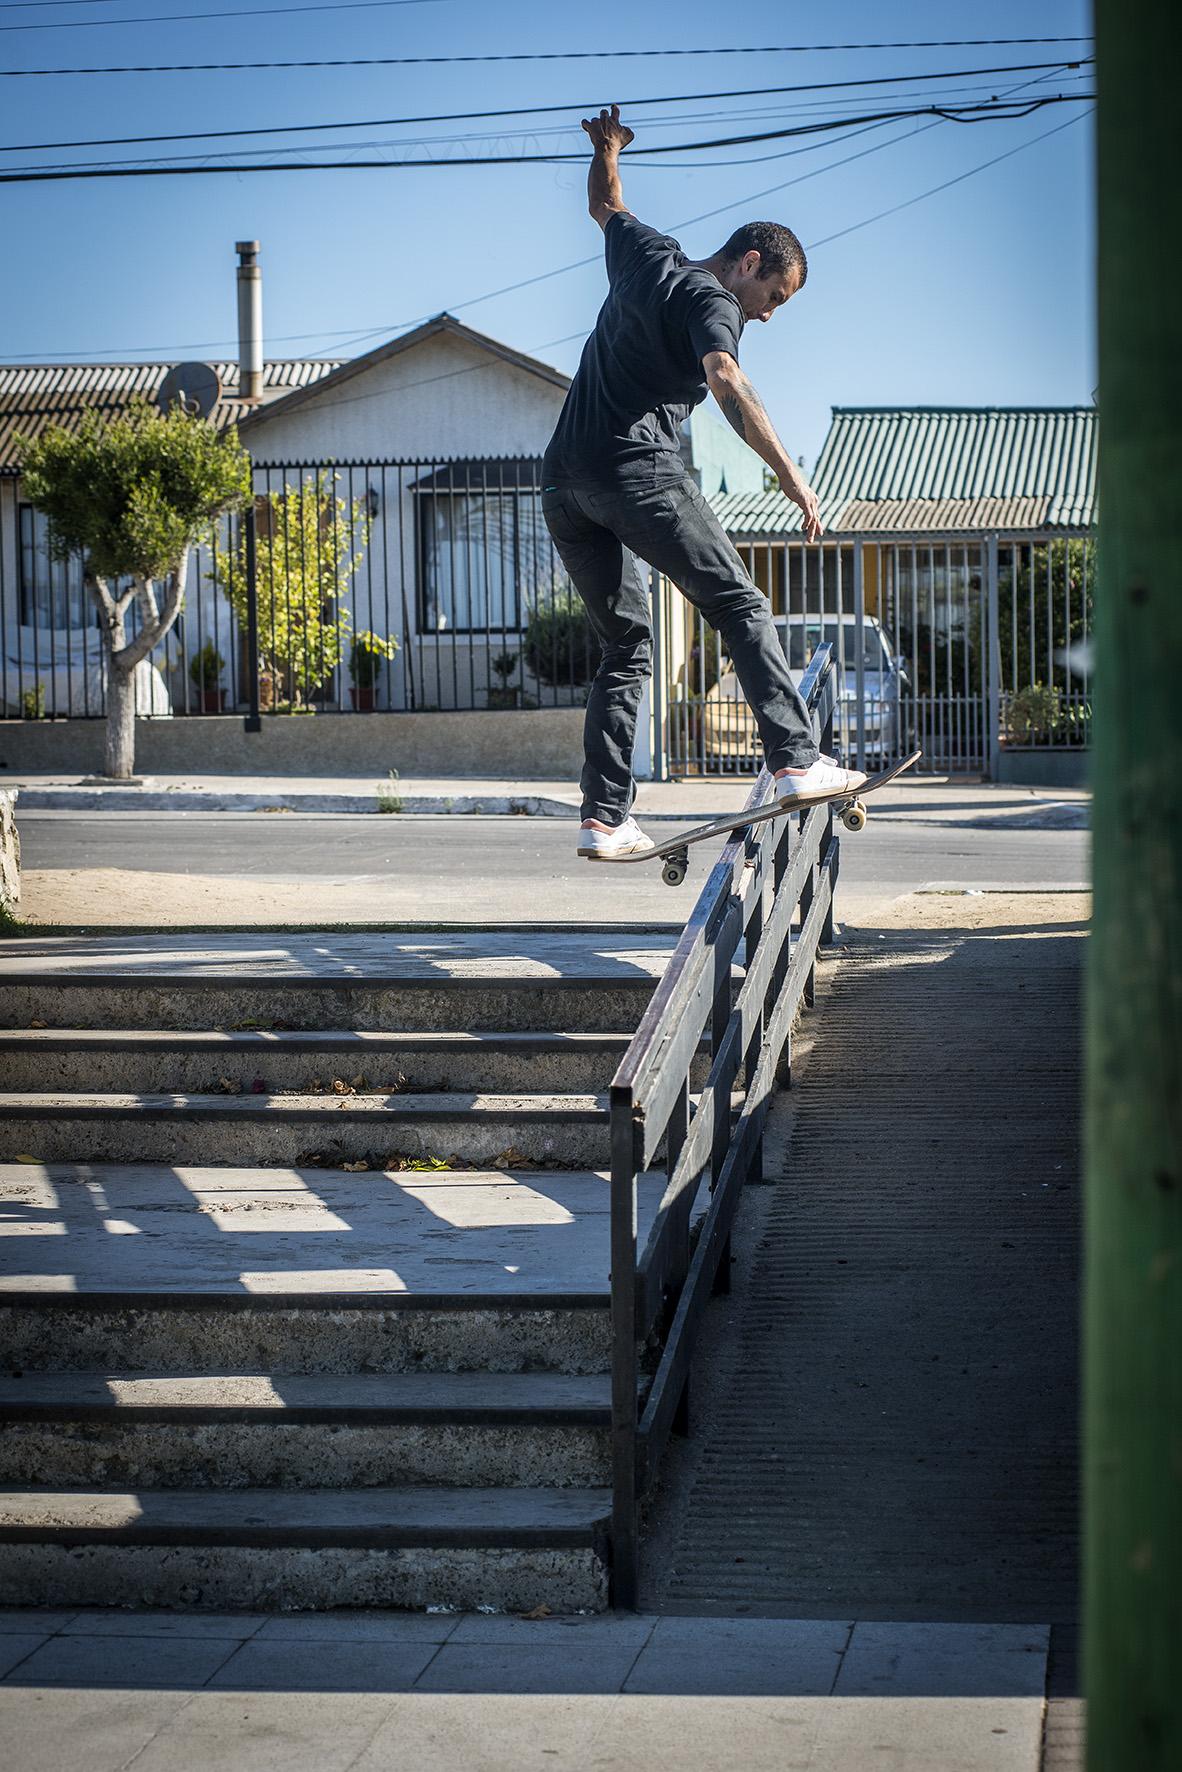 DAWSON_Fs-Boardslide_LLOLLEO